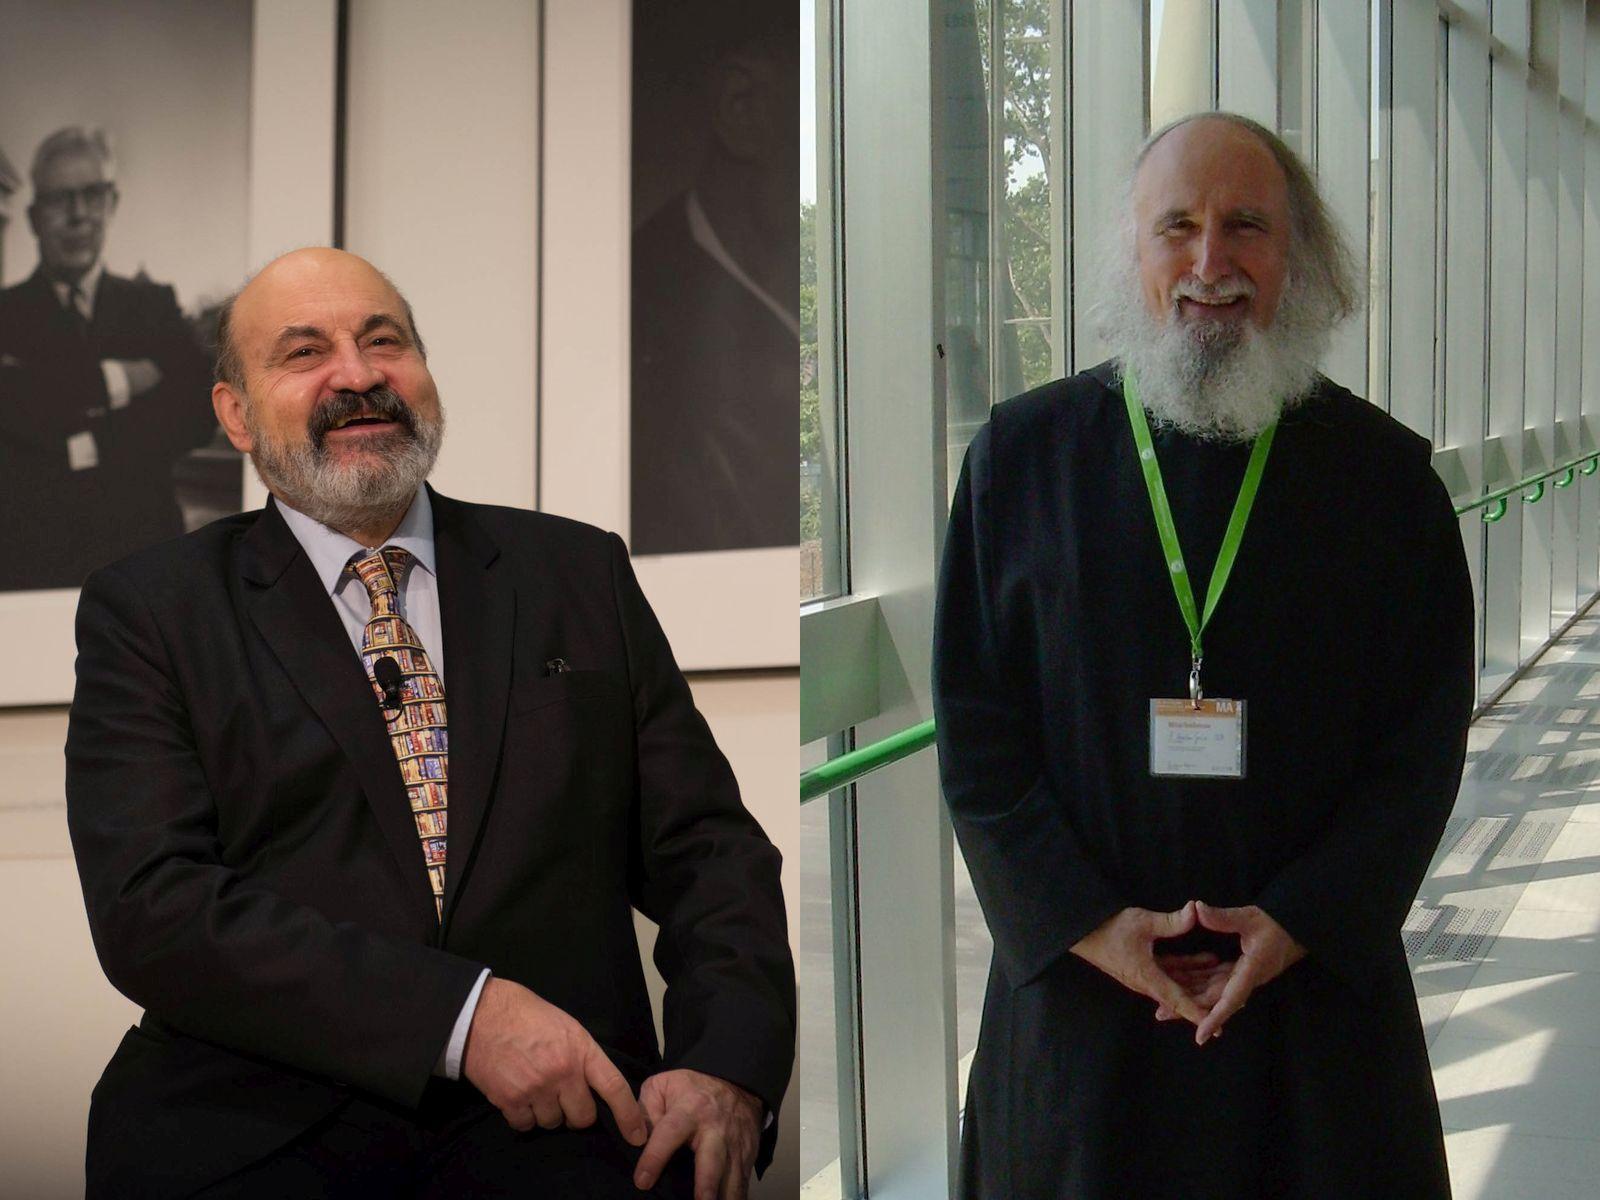 Ks. Tomáš Halík i Anselm Grün OSB